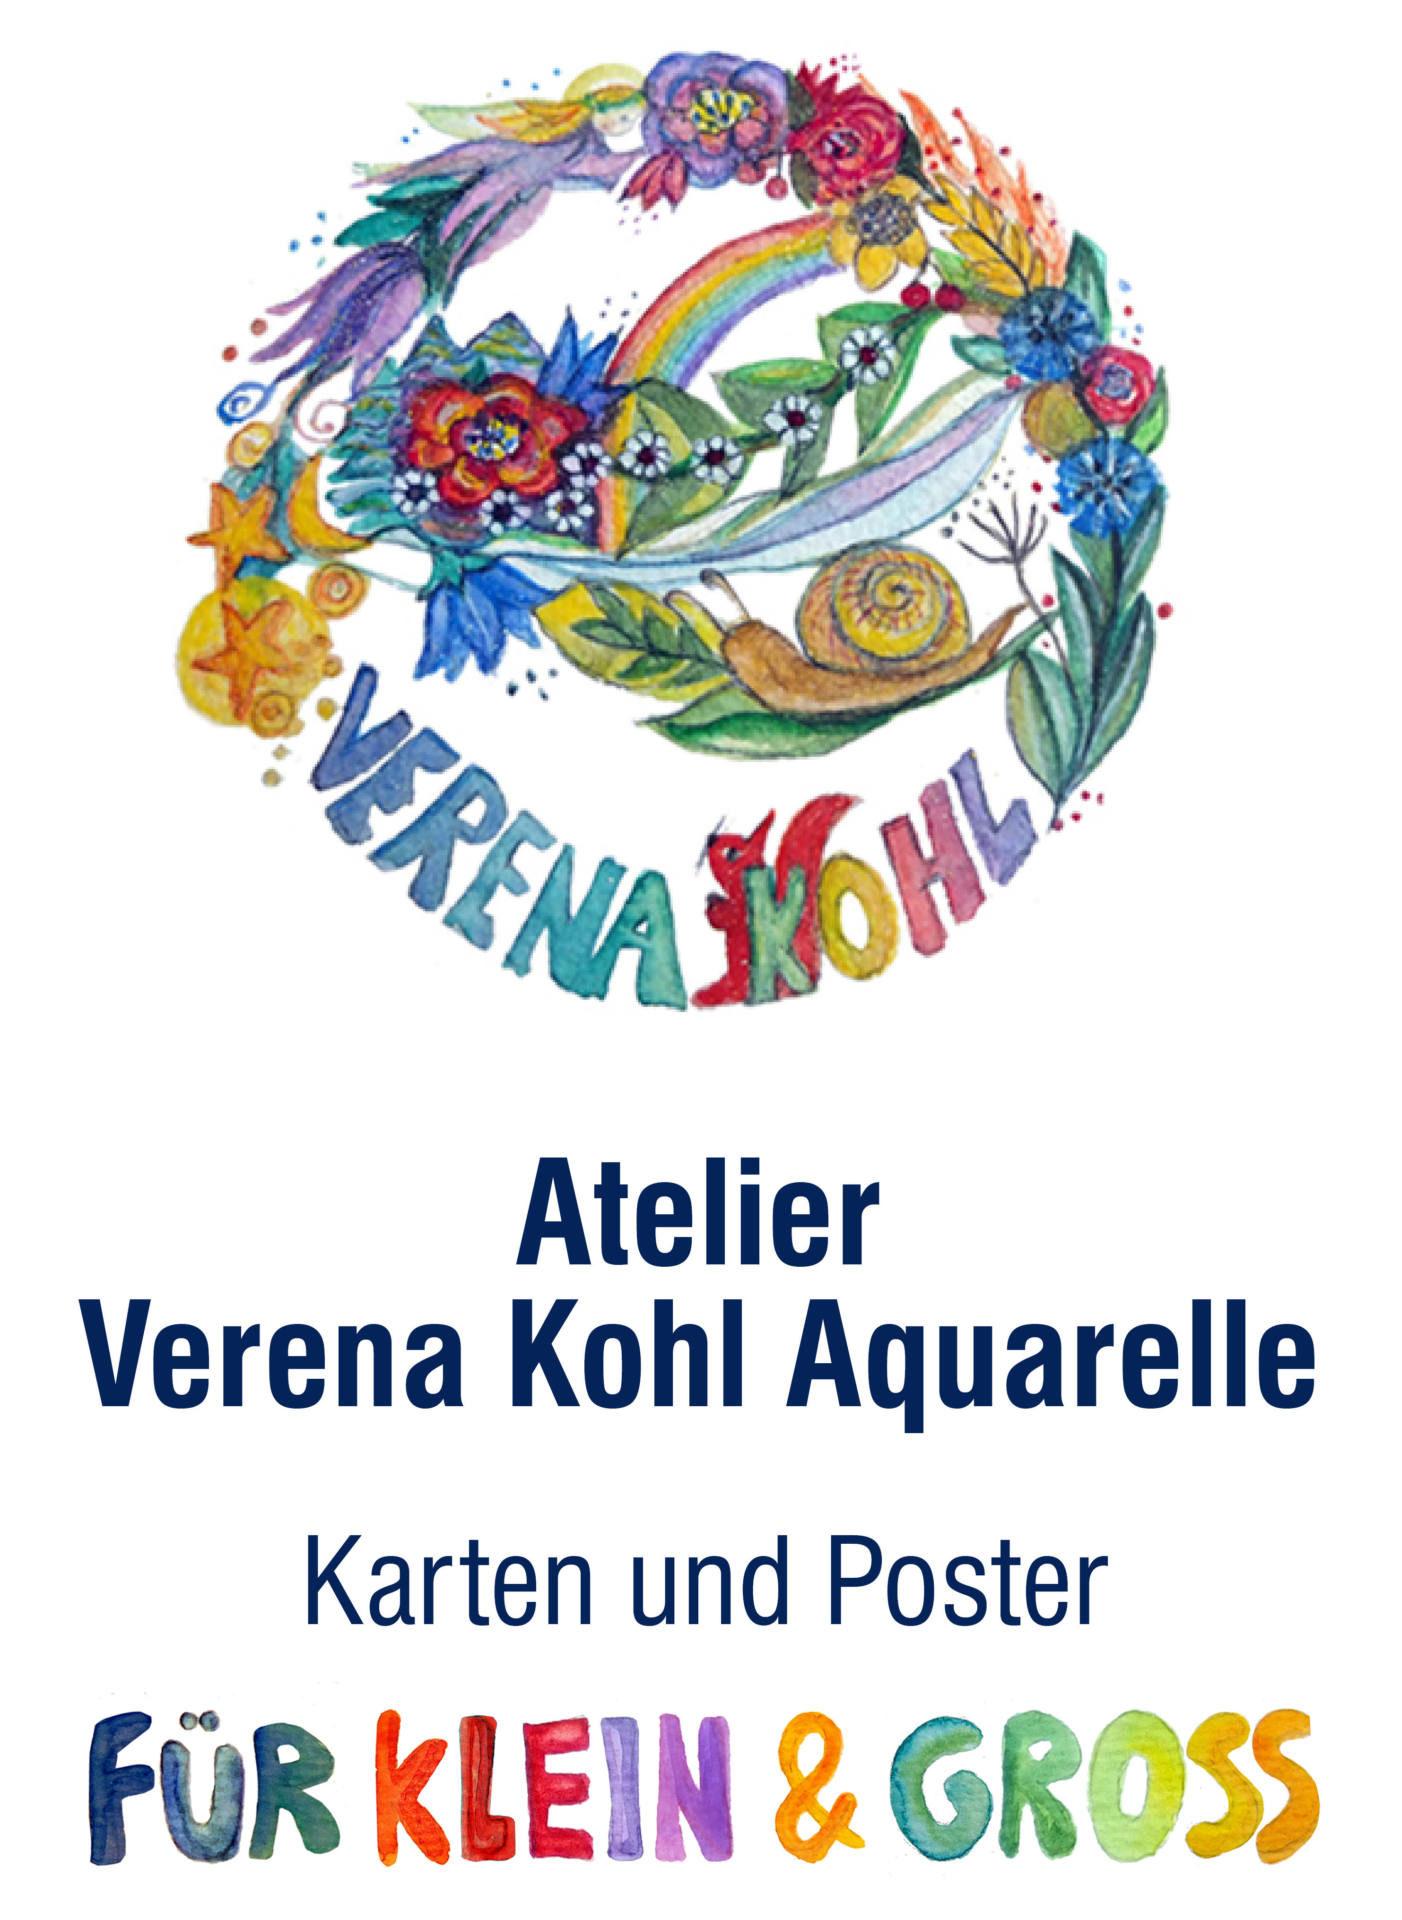 Atelier Verena Kohl / Ustd-IdNr: DE313636448